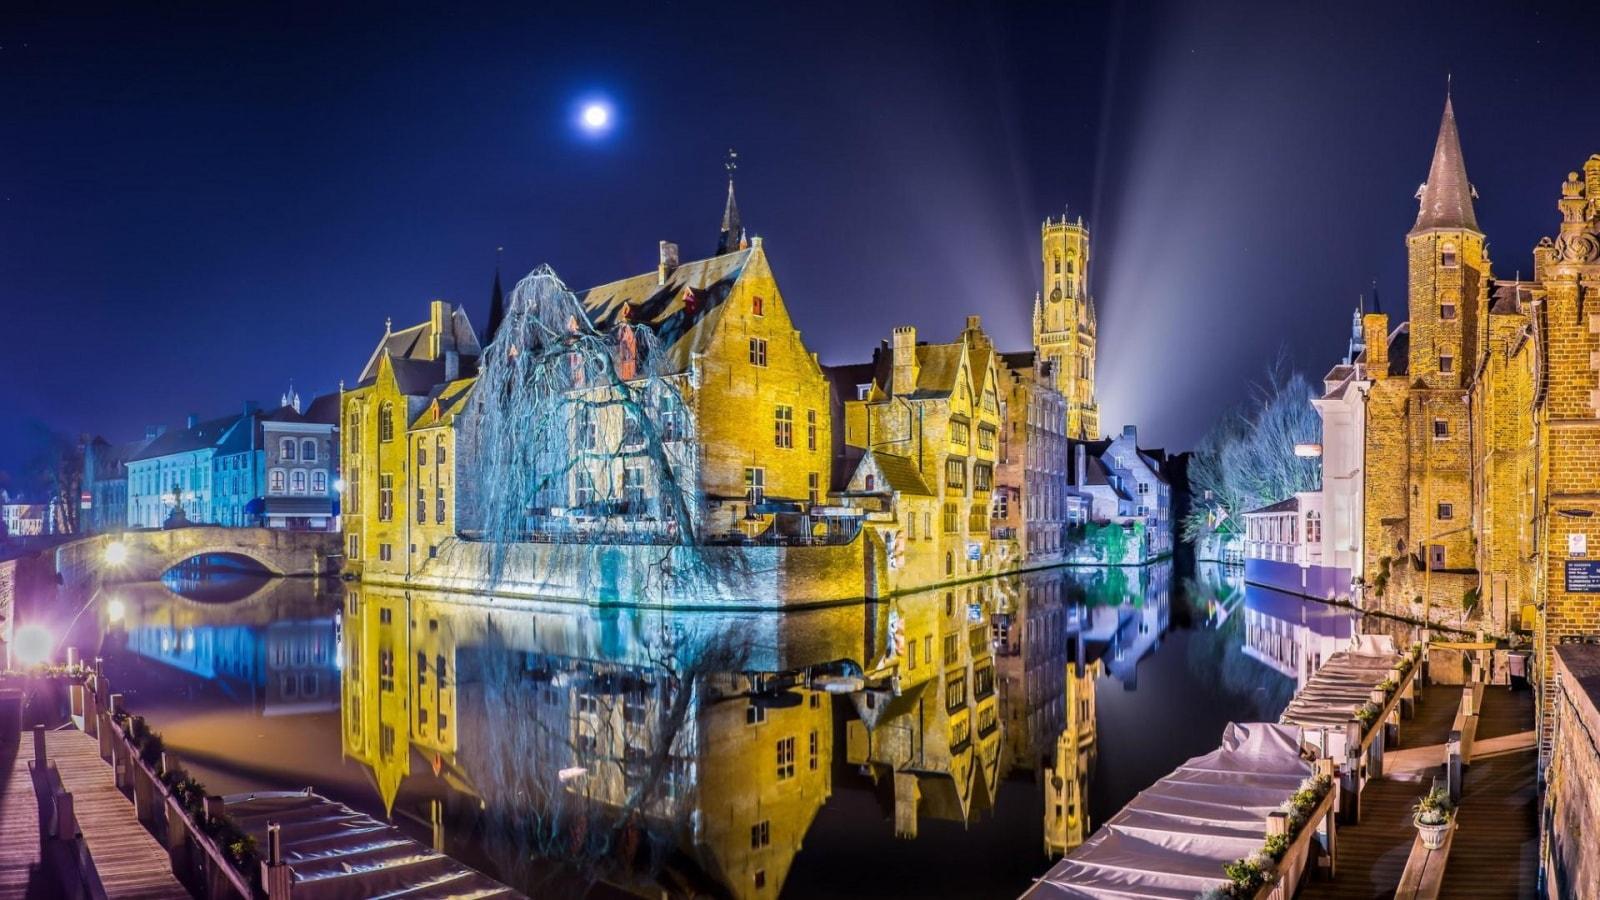 Bruges widescreen